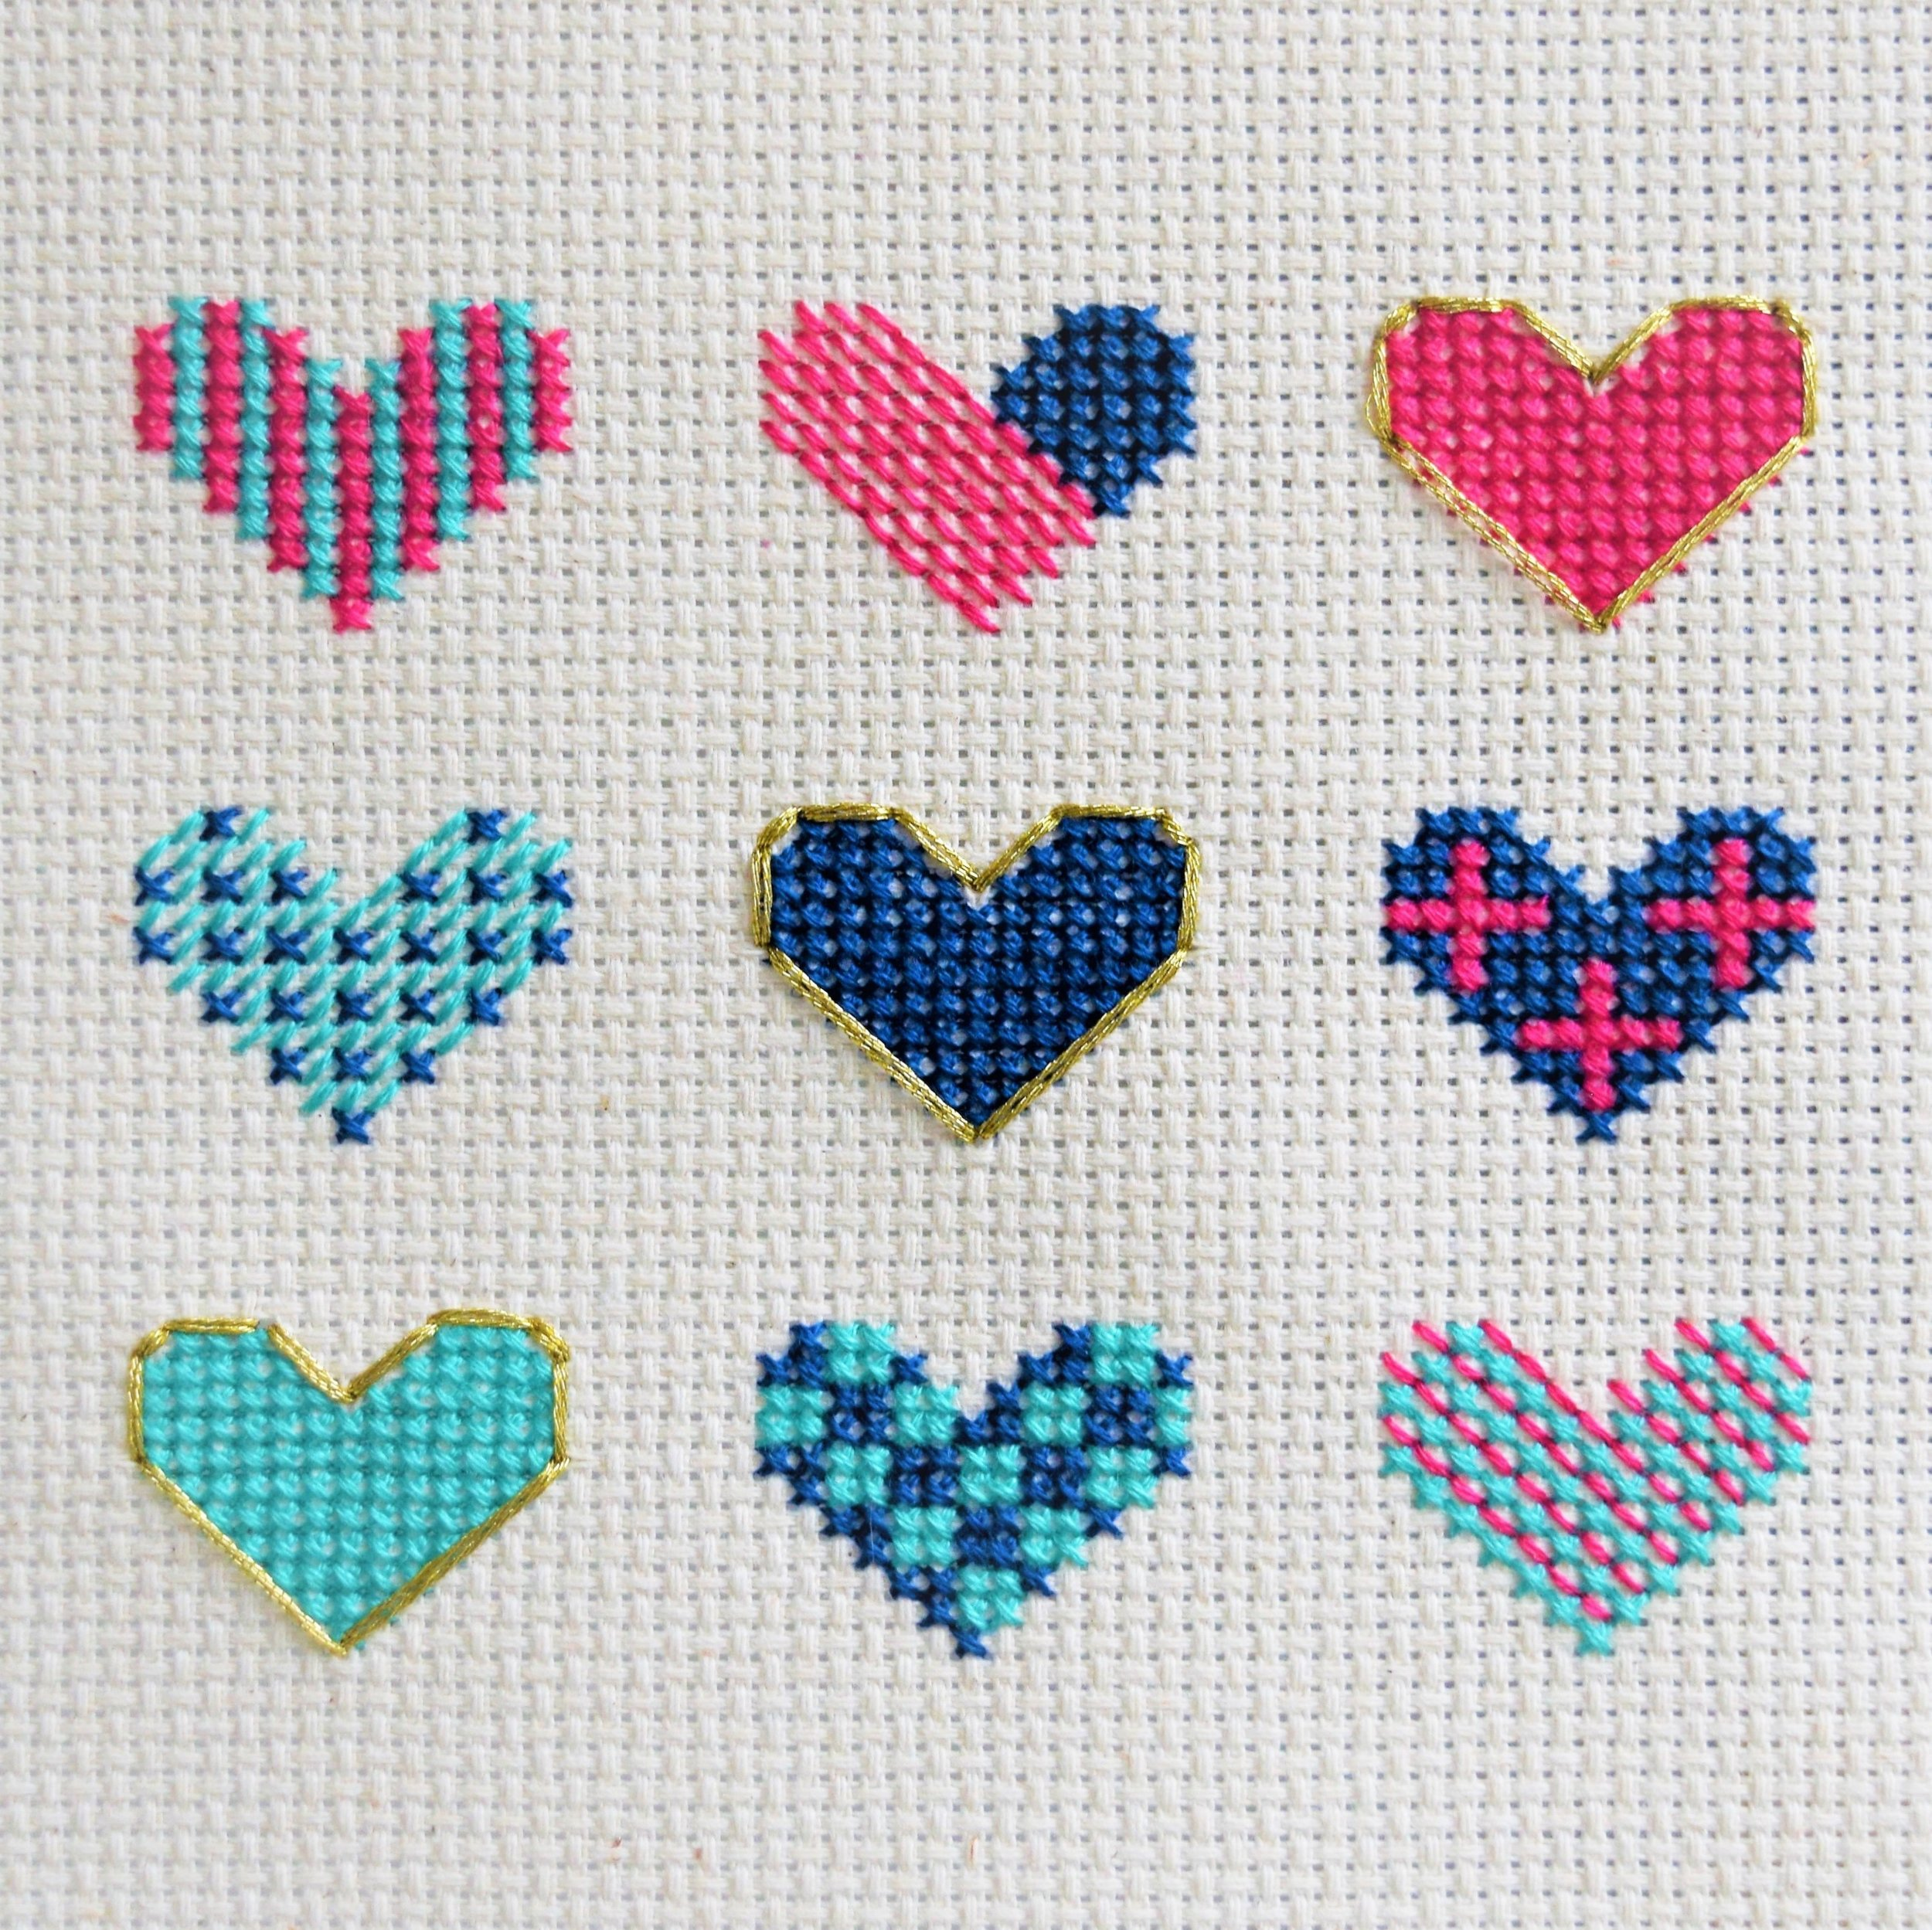 3. Heart Sampler cross stitch pattern - Blue Octopus Stitchcraft